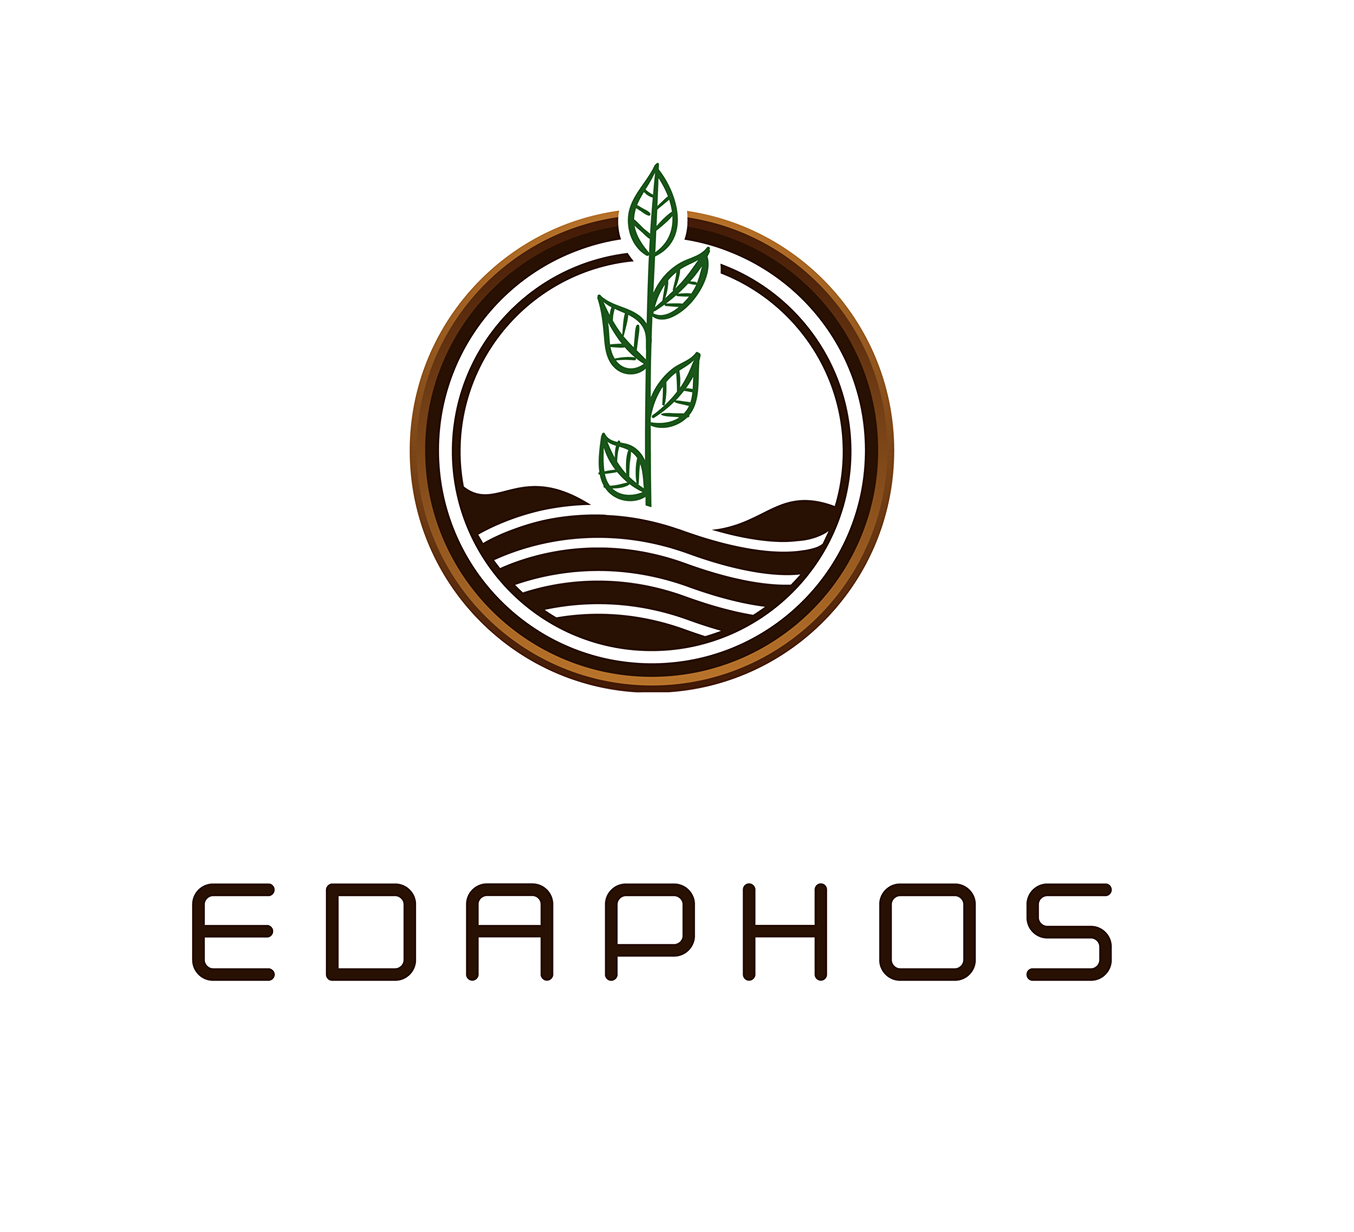 Edaphos - Innovales